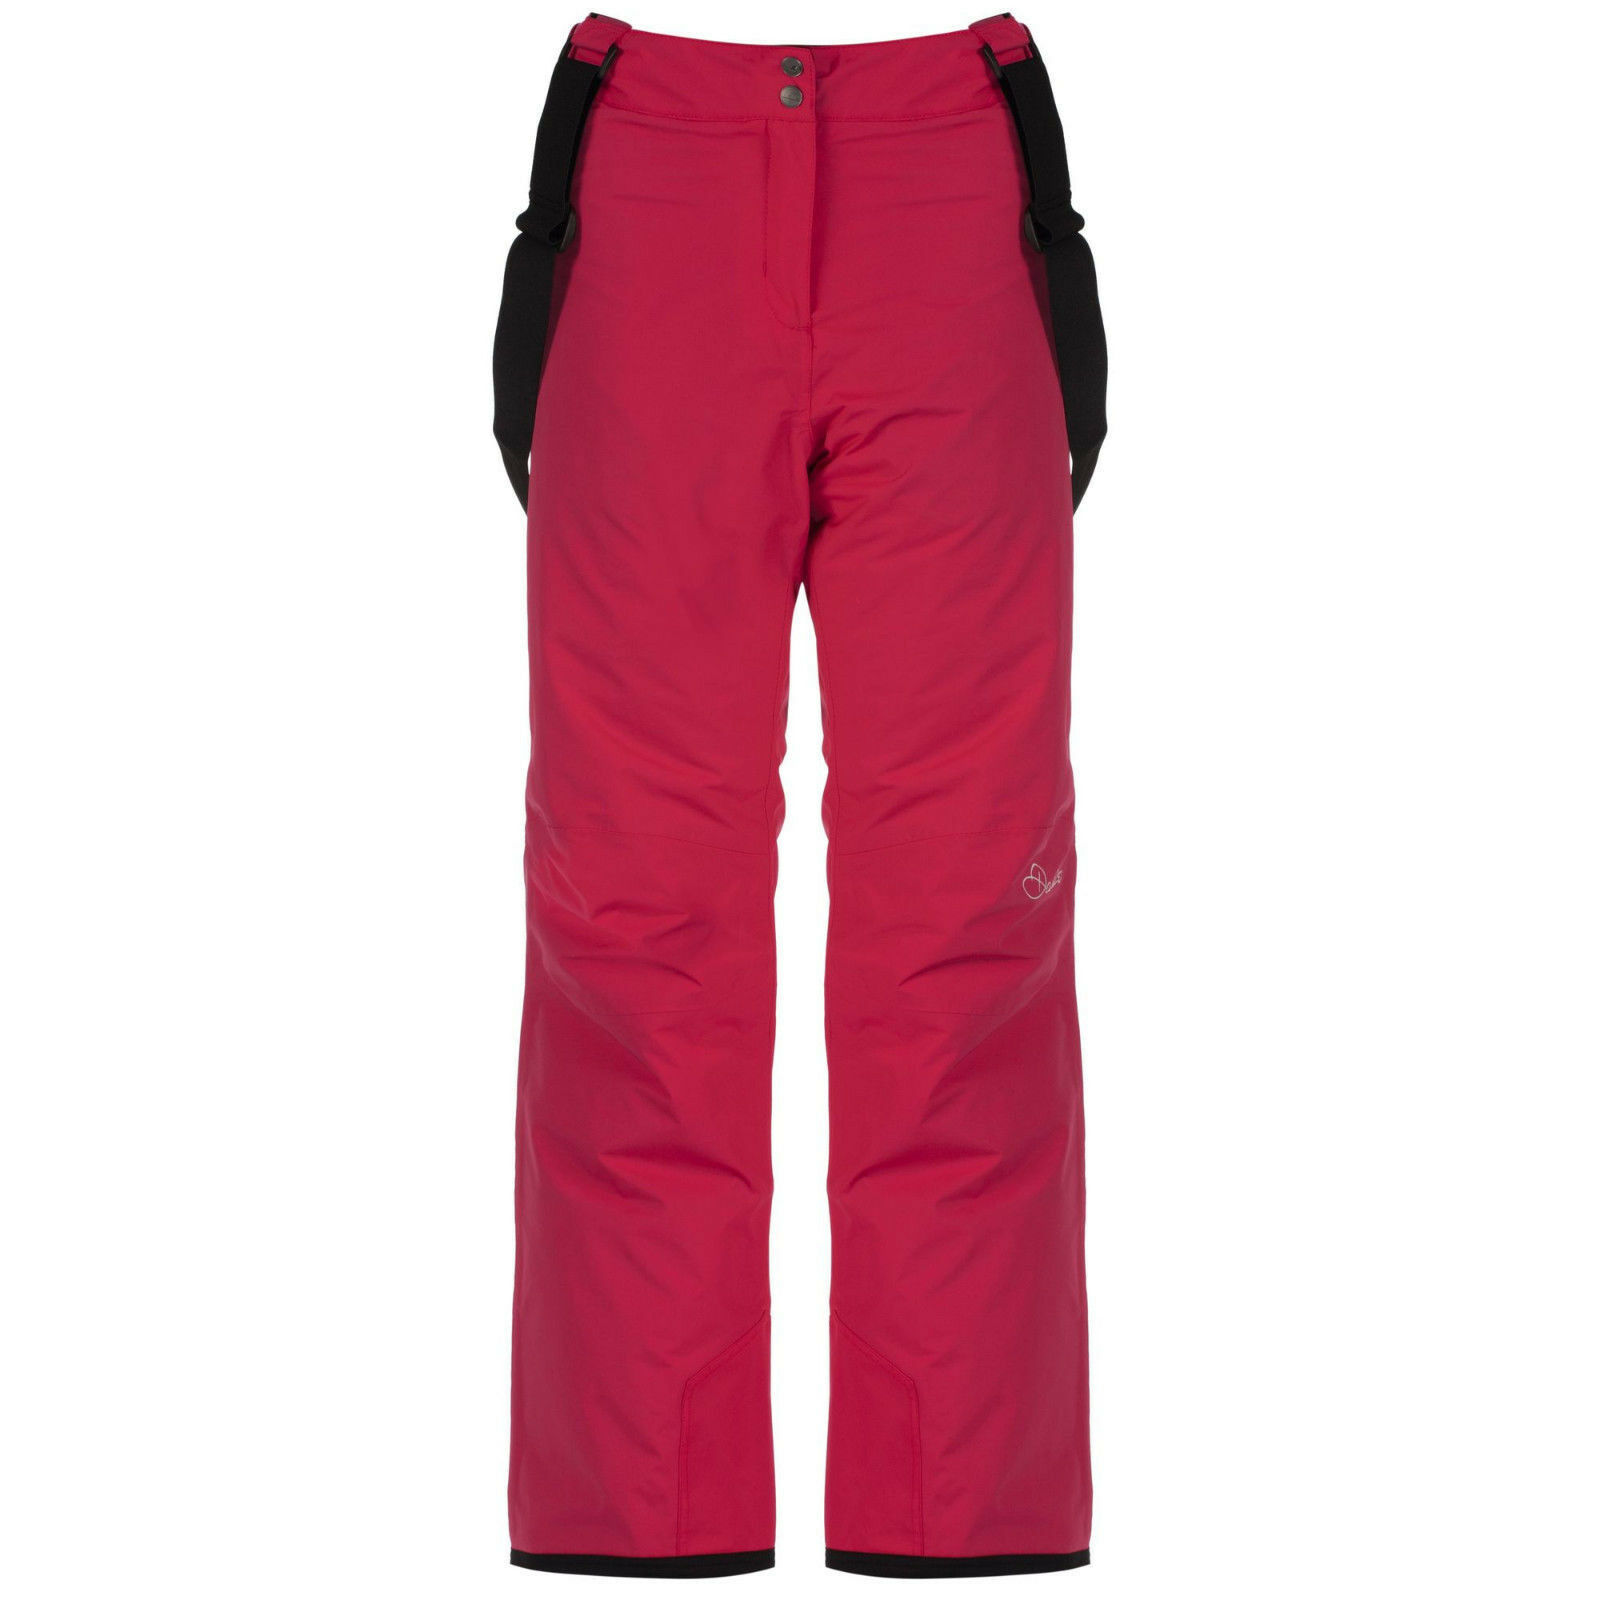 DARE2B Womens ATTRACT II DUCHESS PINK Ski Pants Ladies  Salopettes 8 - 20 REG LEG  sale online discount low price